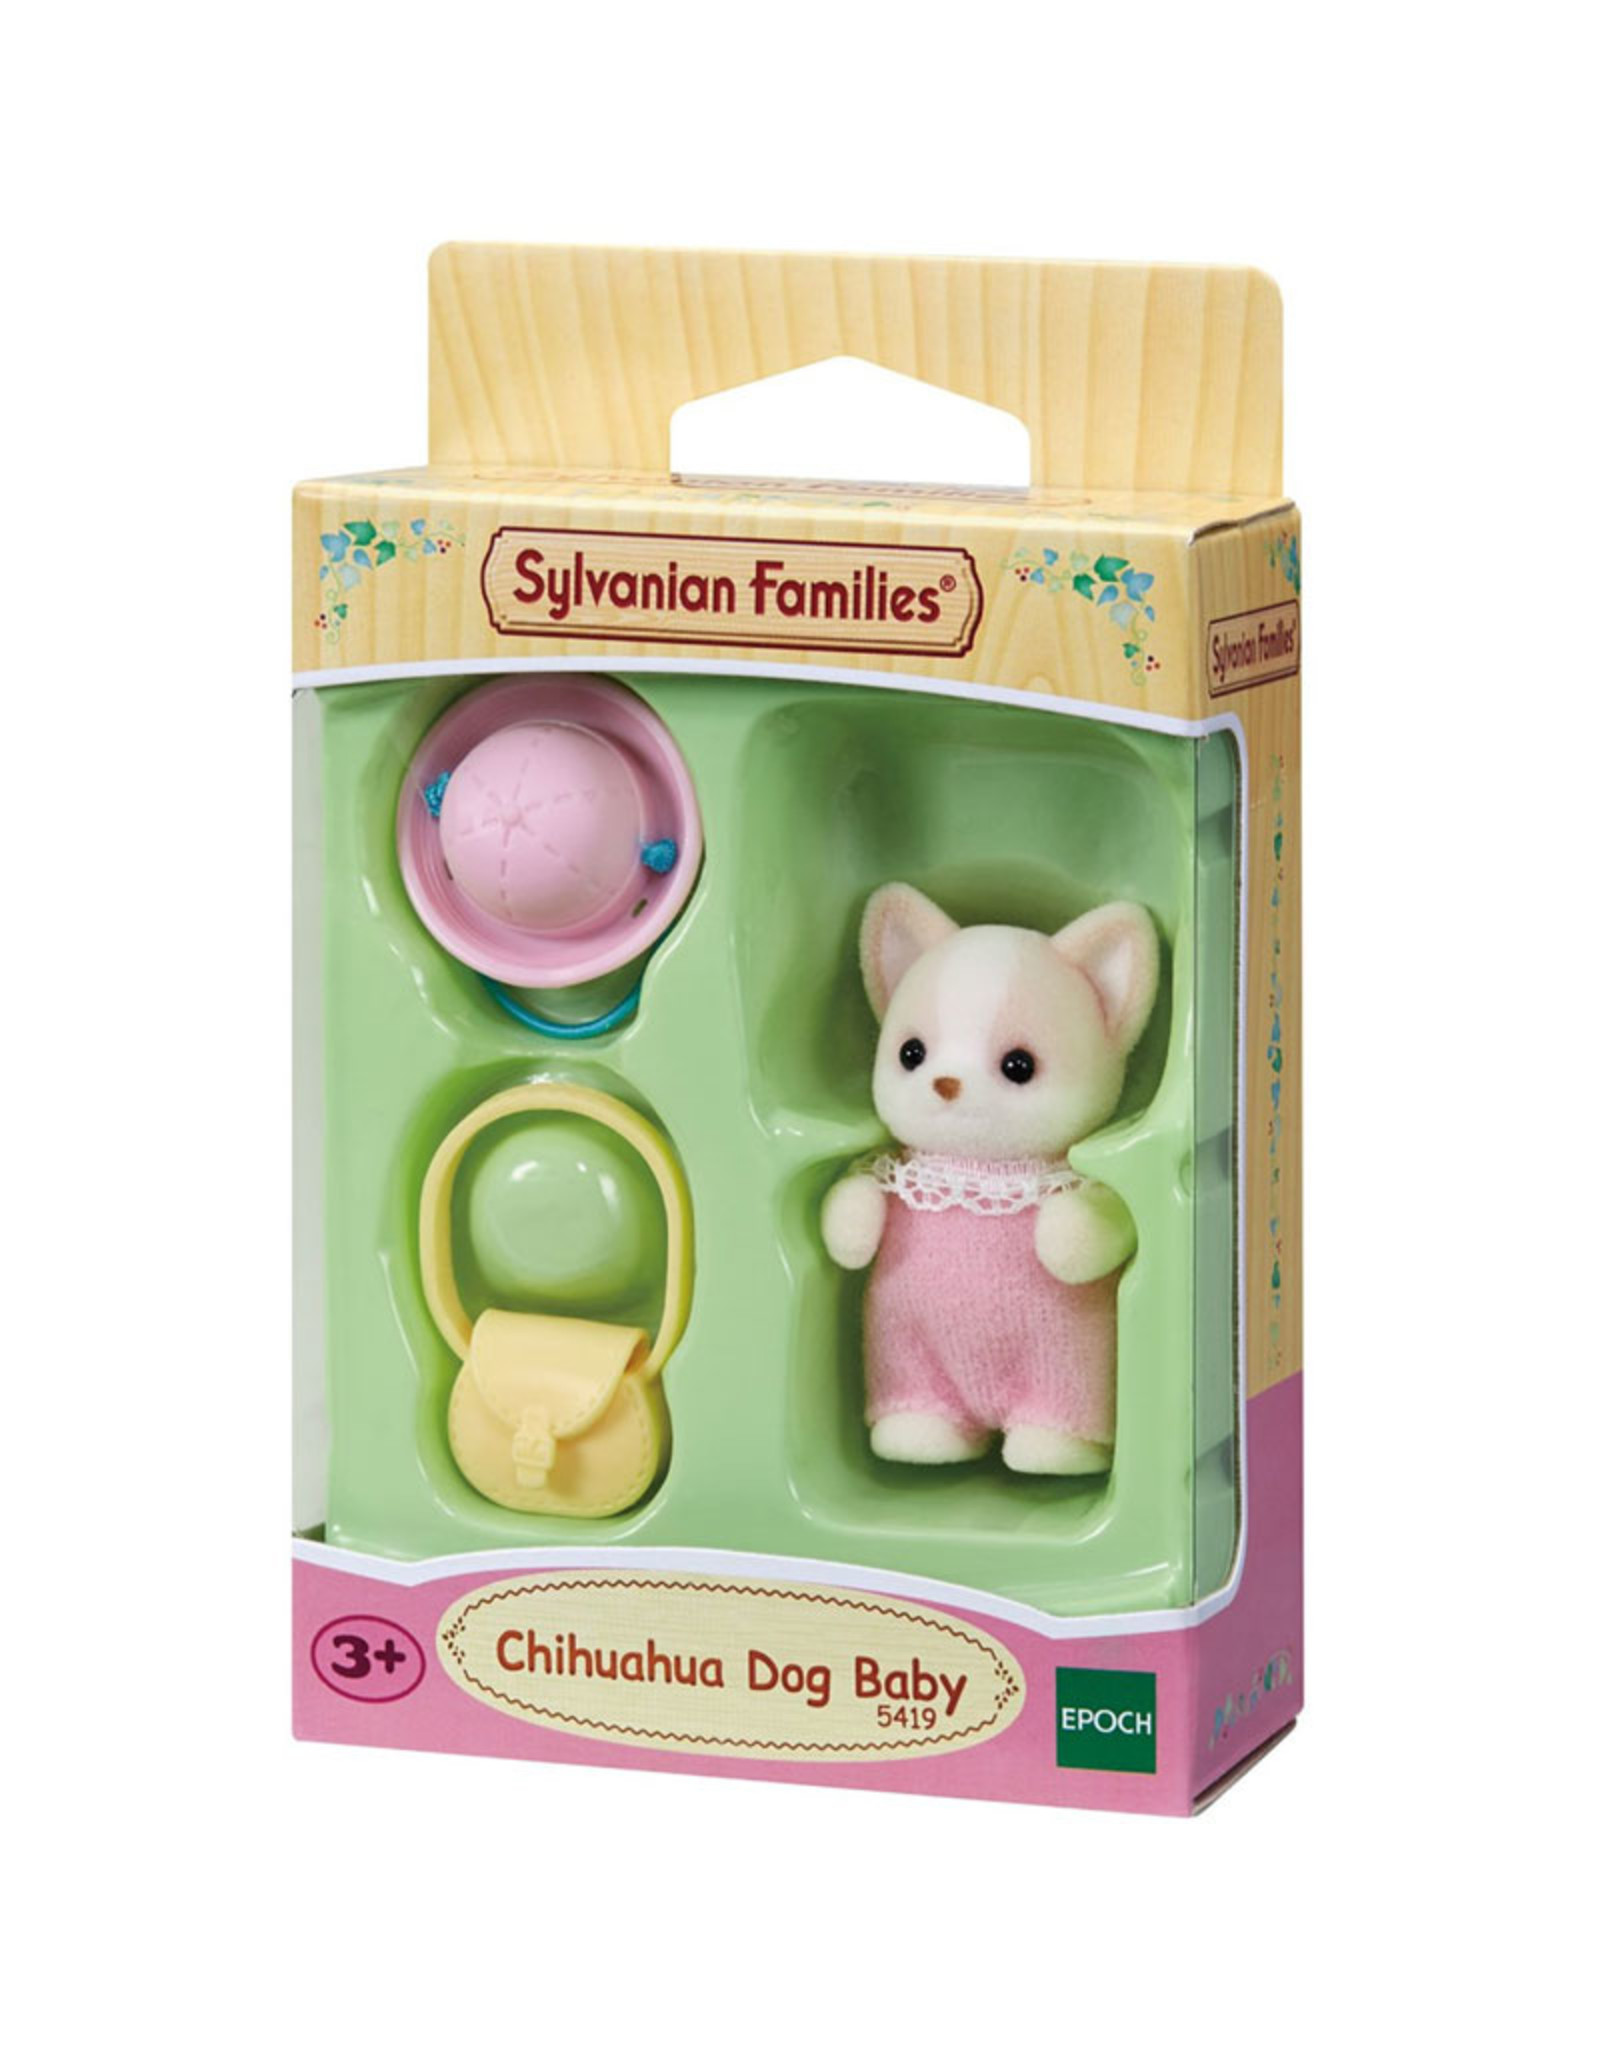 Sylvanian Families Baby Chihuahua